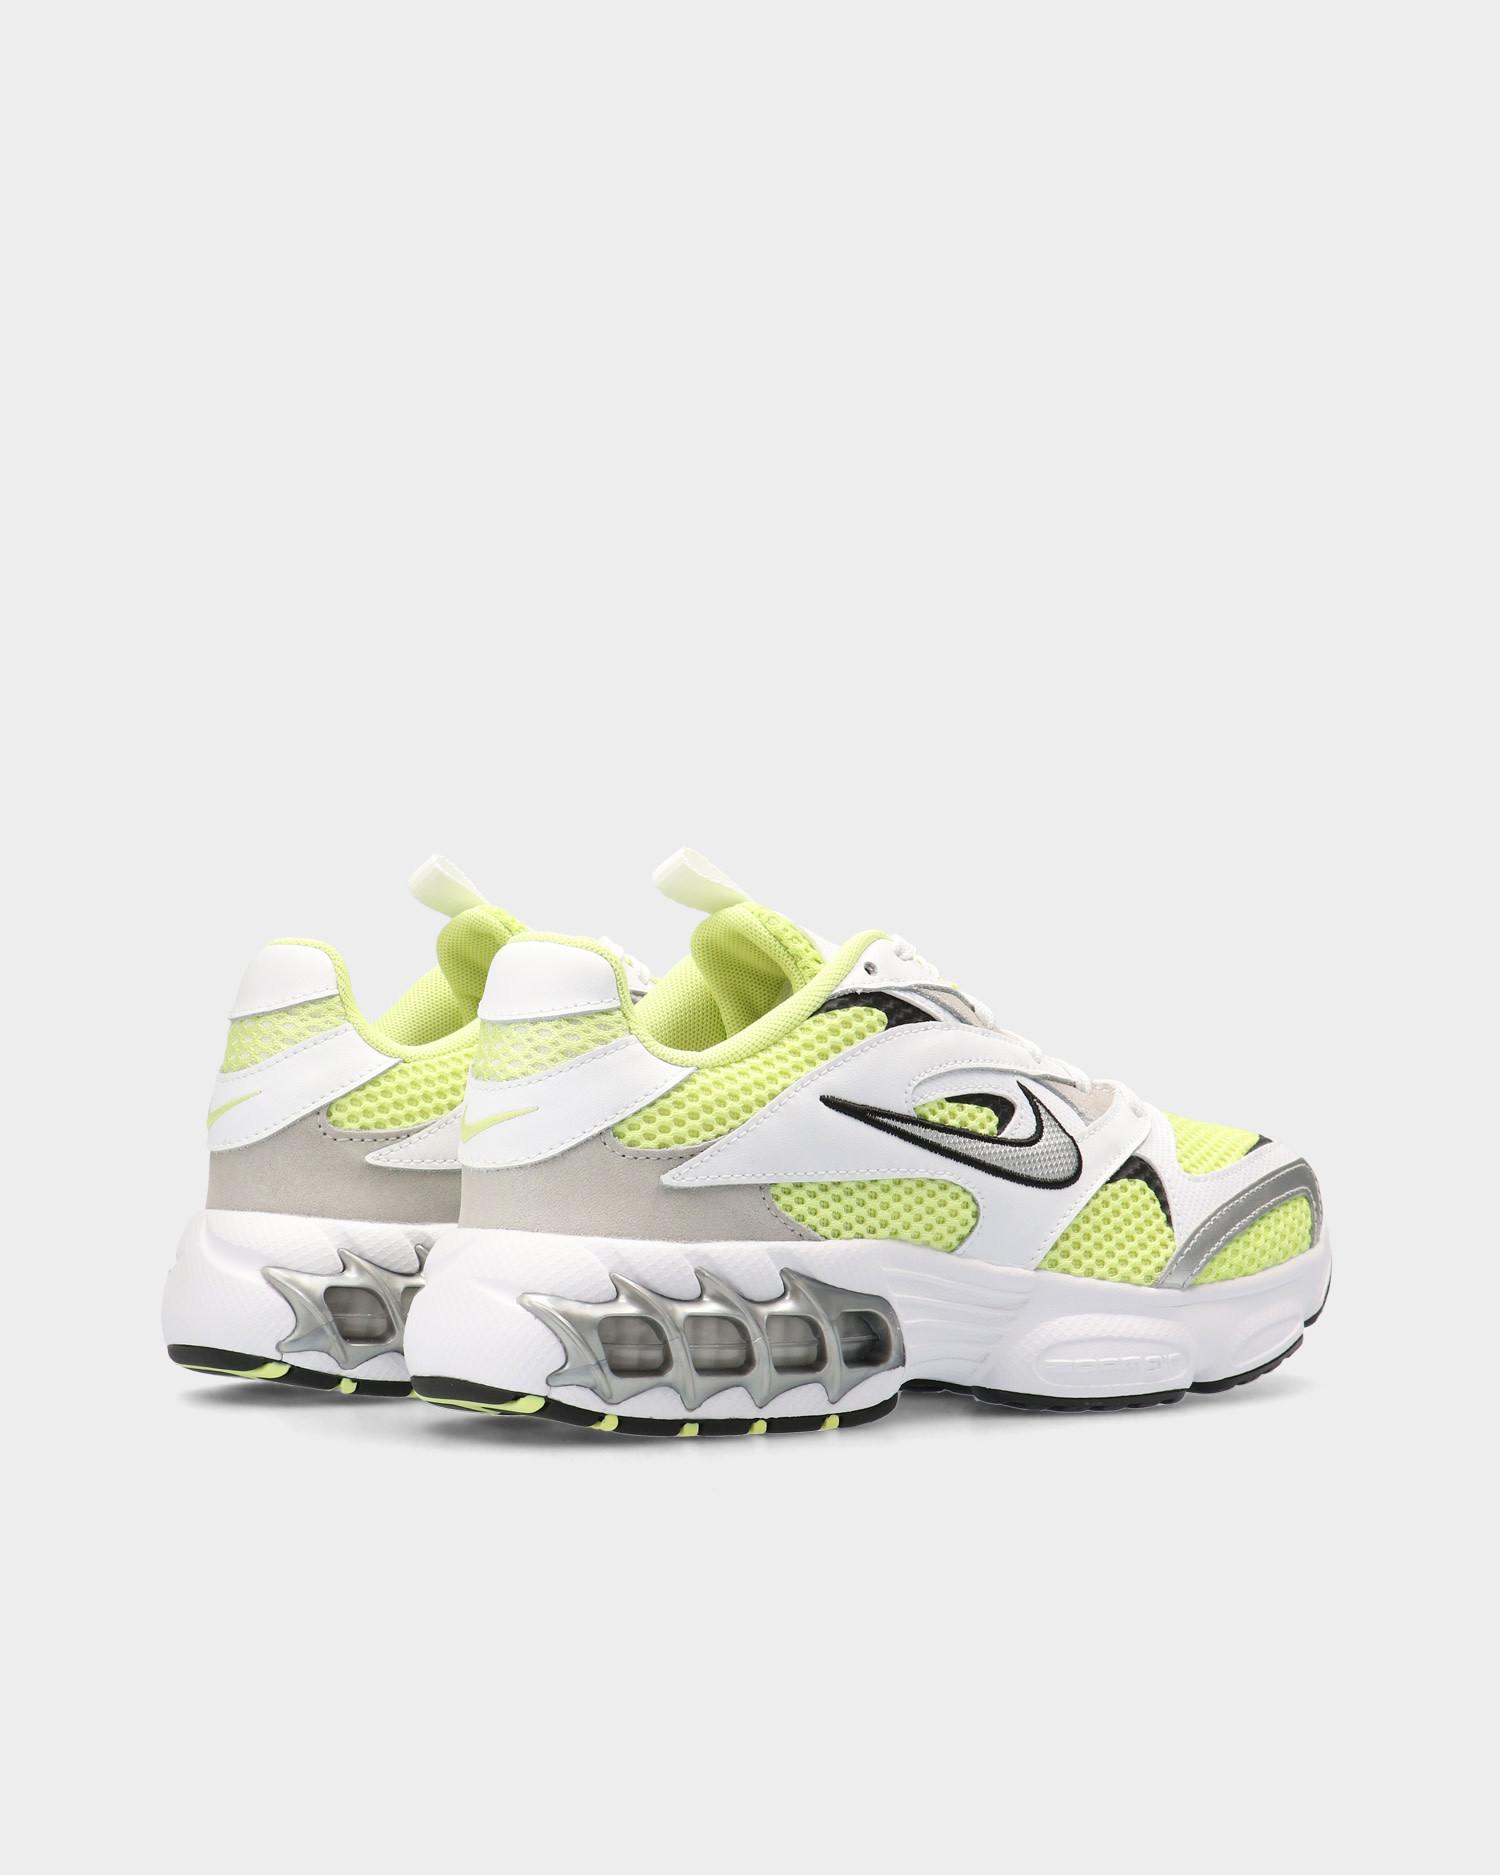 Nike Zoom Air Fire White/metallic silver-lt lemon twist